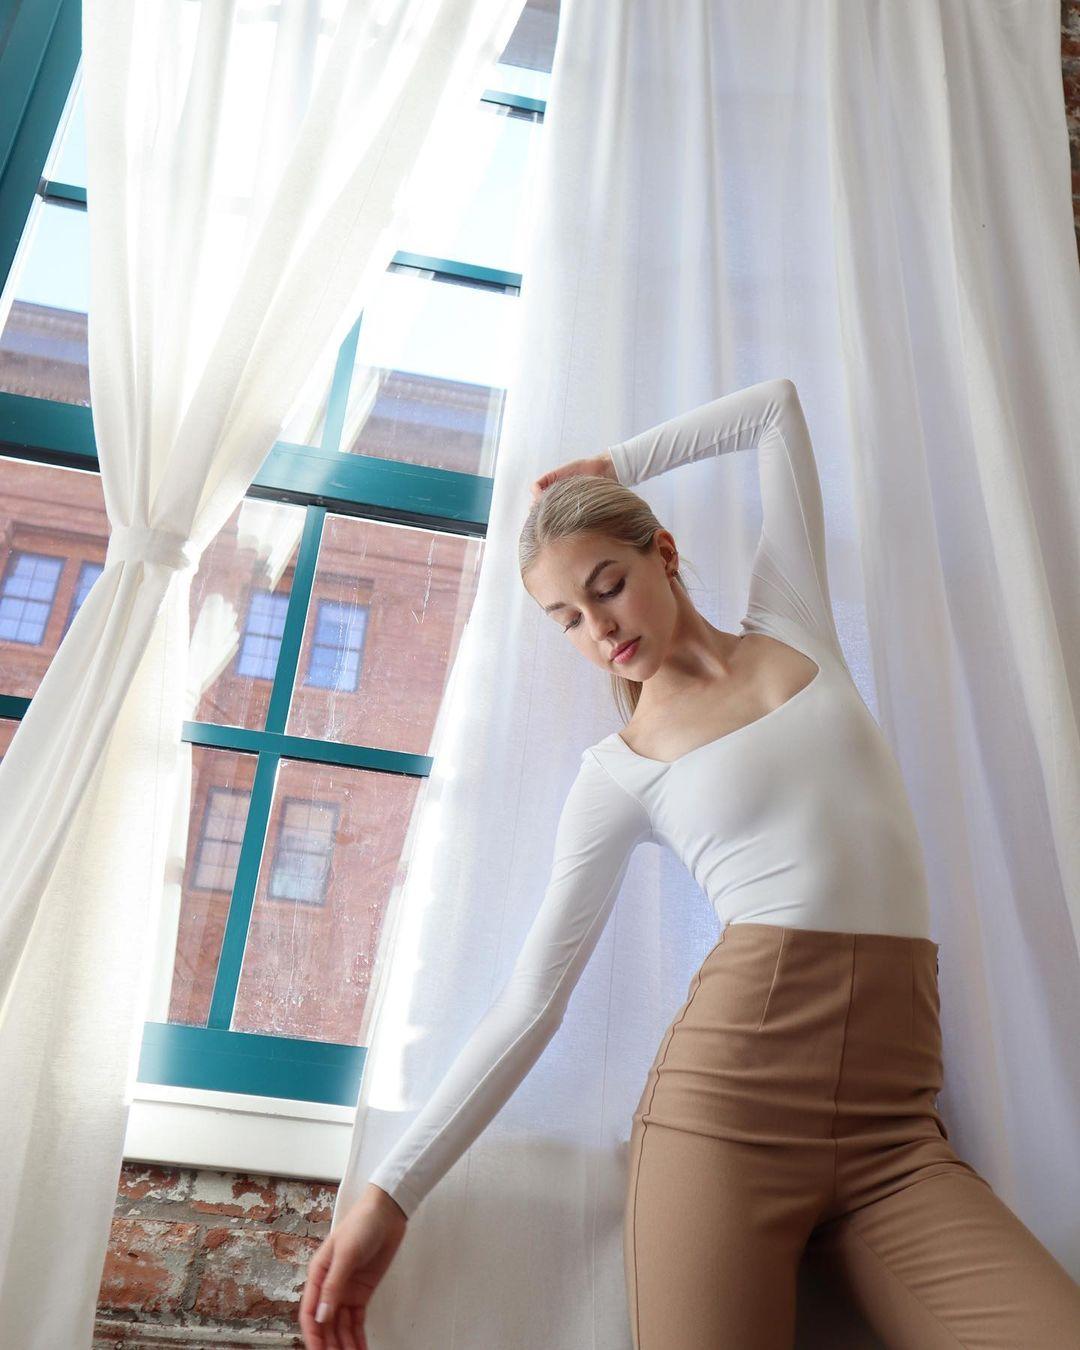 Gabby-C-Thomas-Wallpapers-Insta-Fit-Bio-4